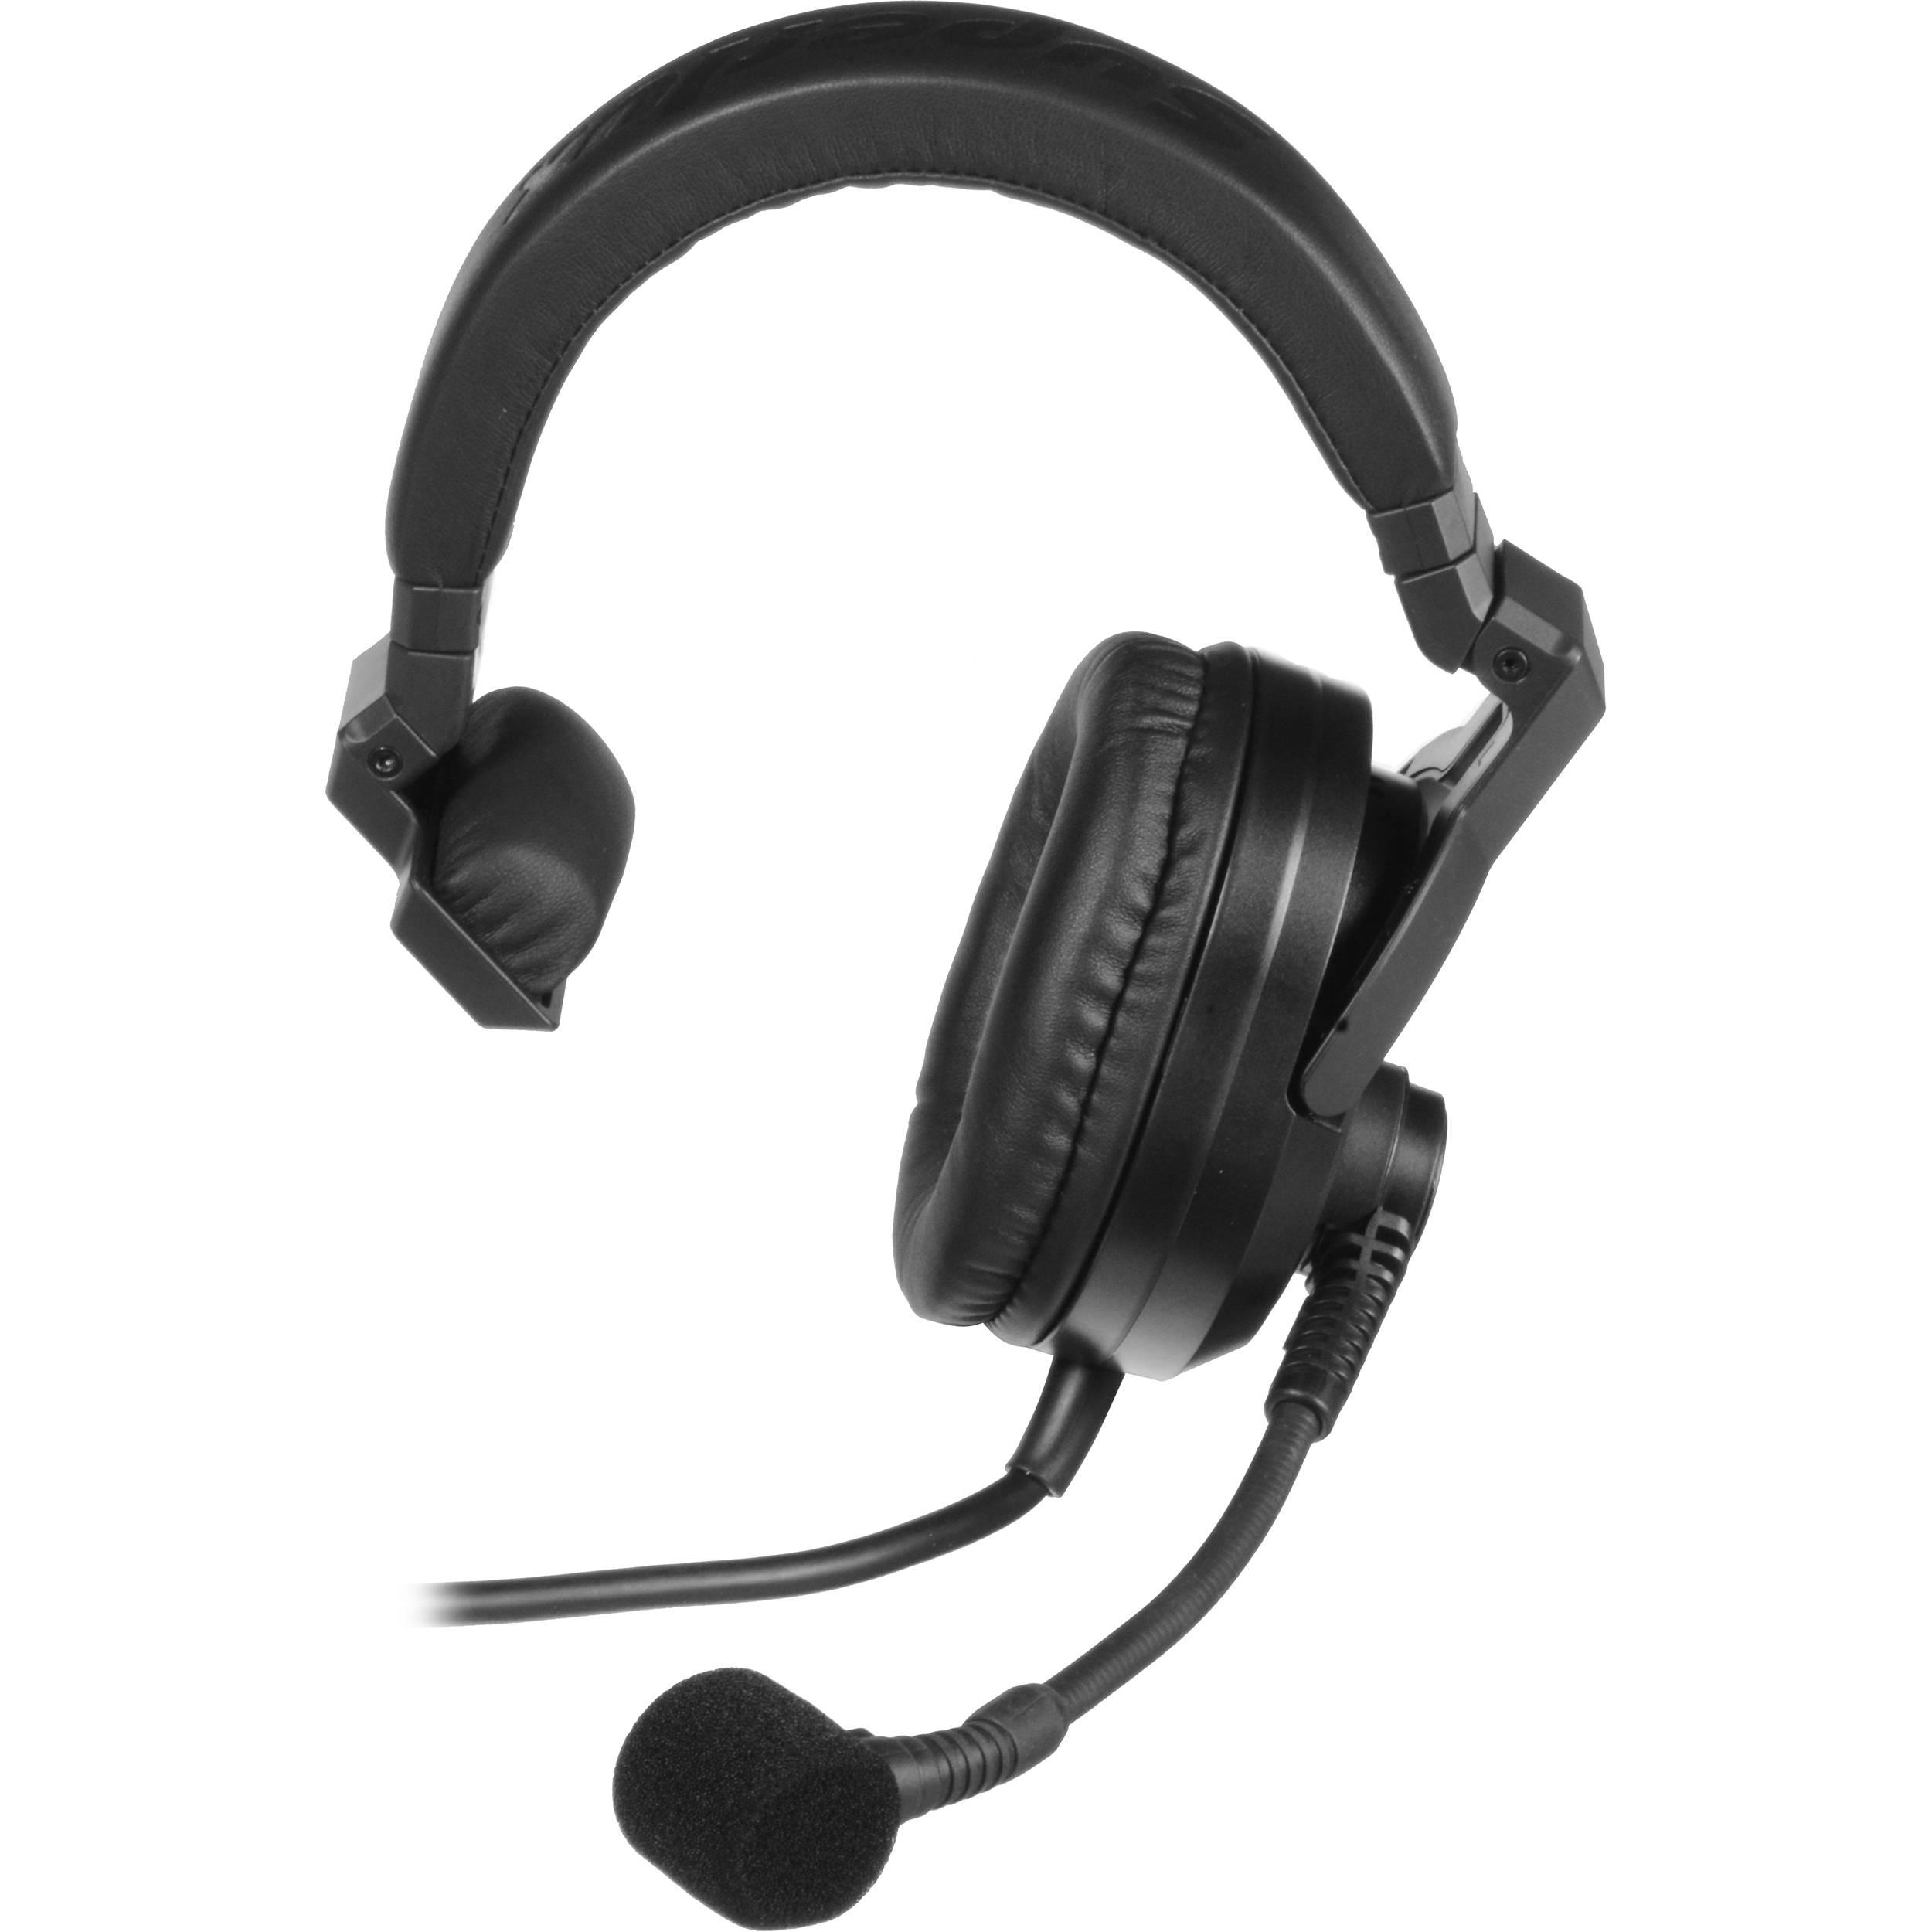 Superlux Hmd 685a Professional Intercom Headset And Boom Microphone